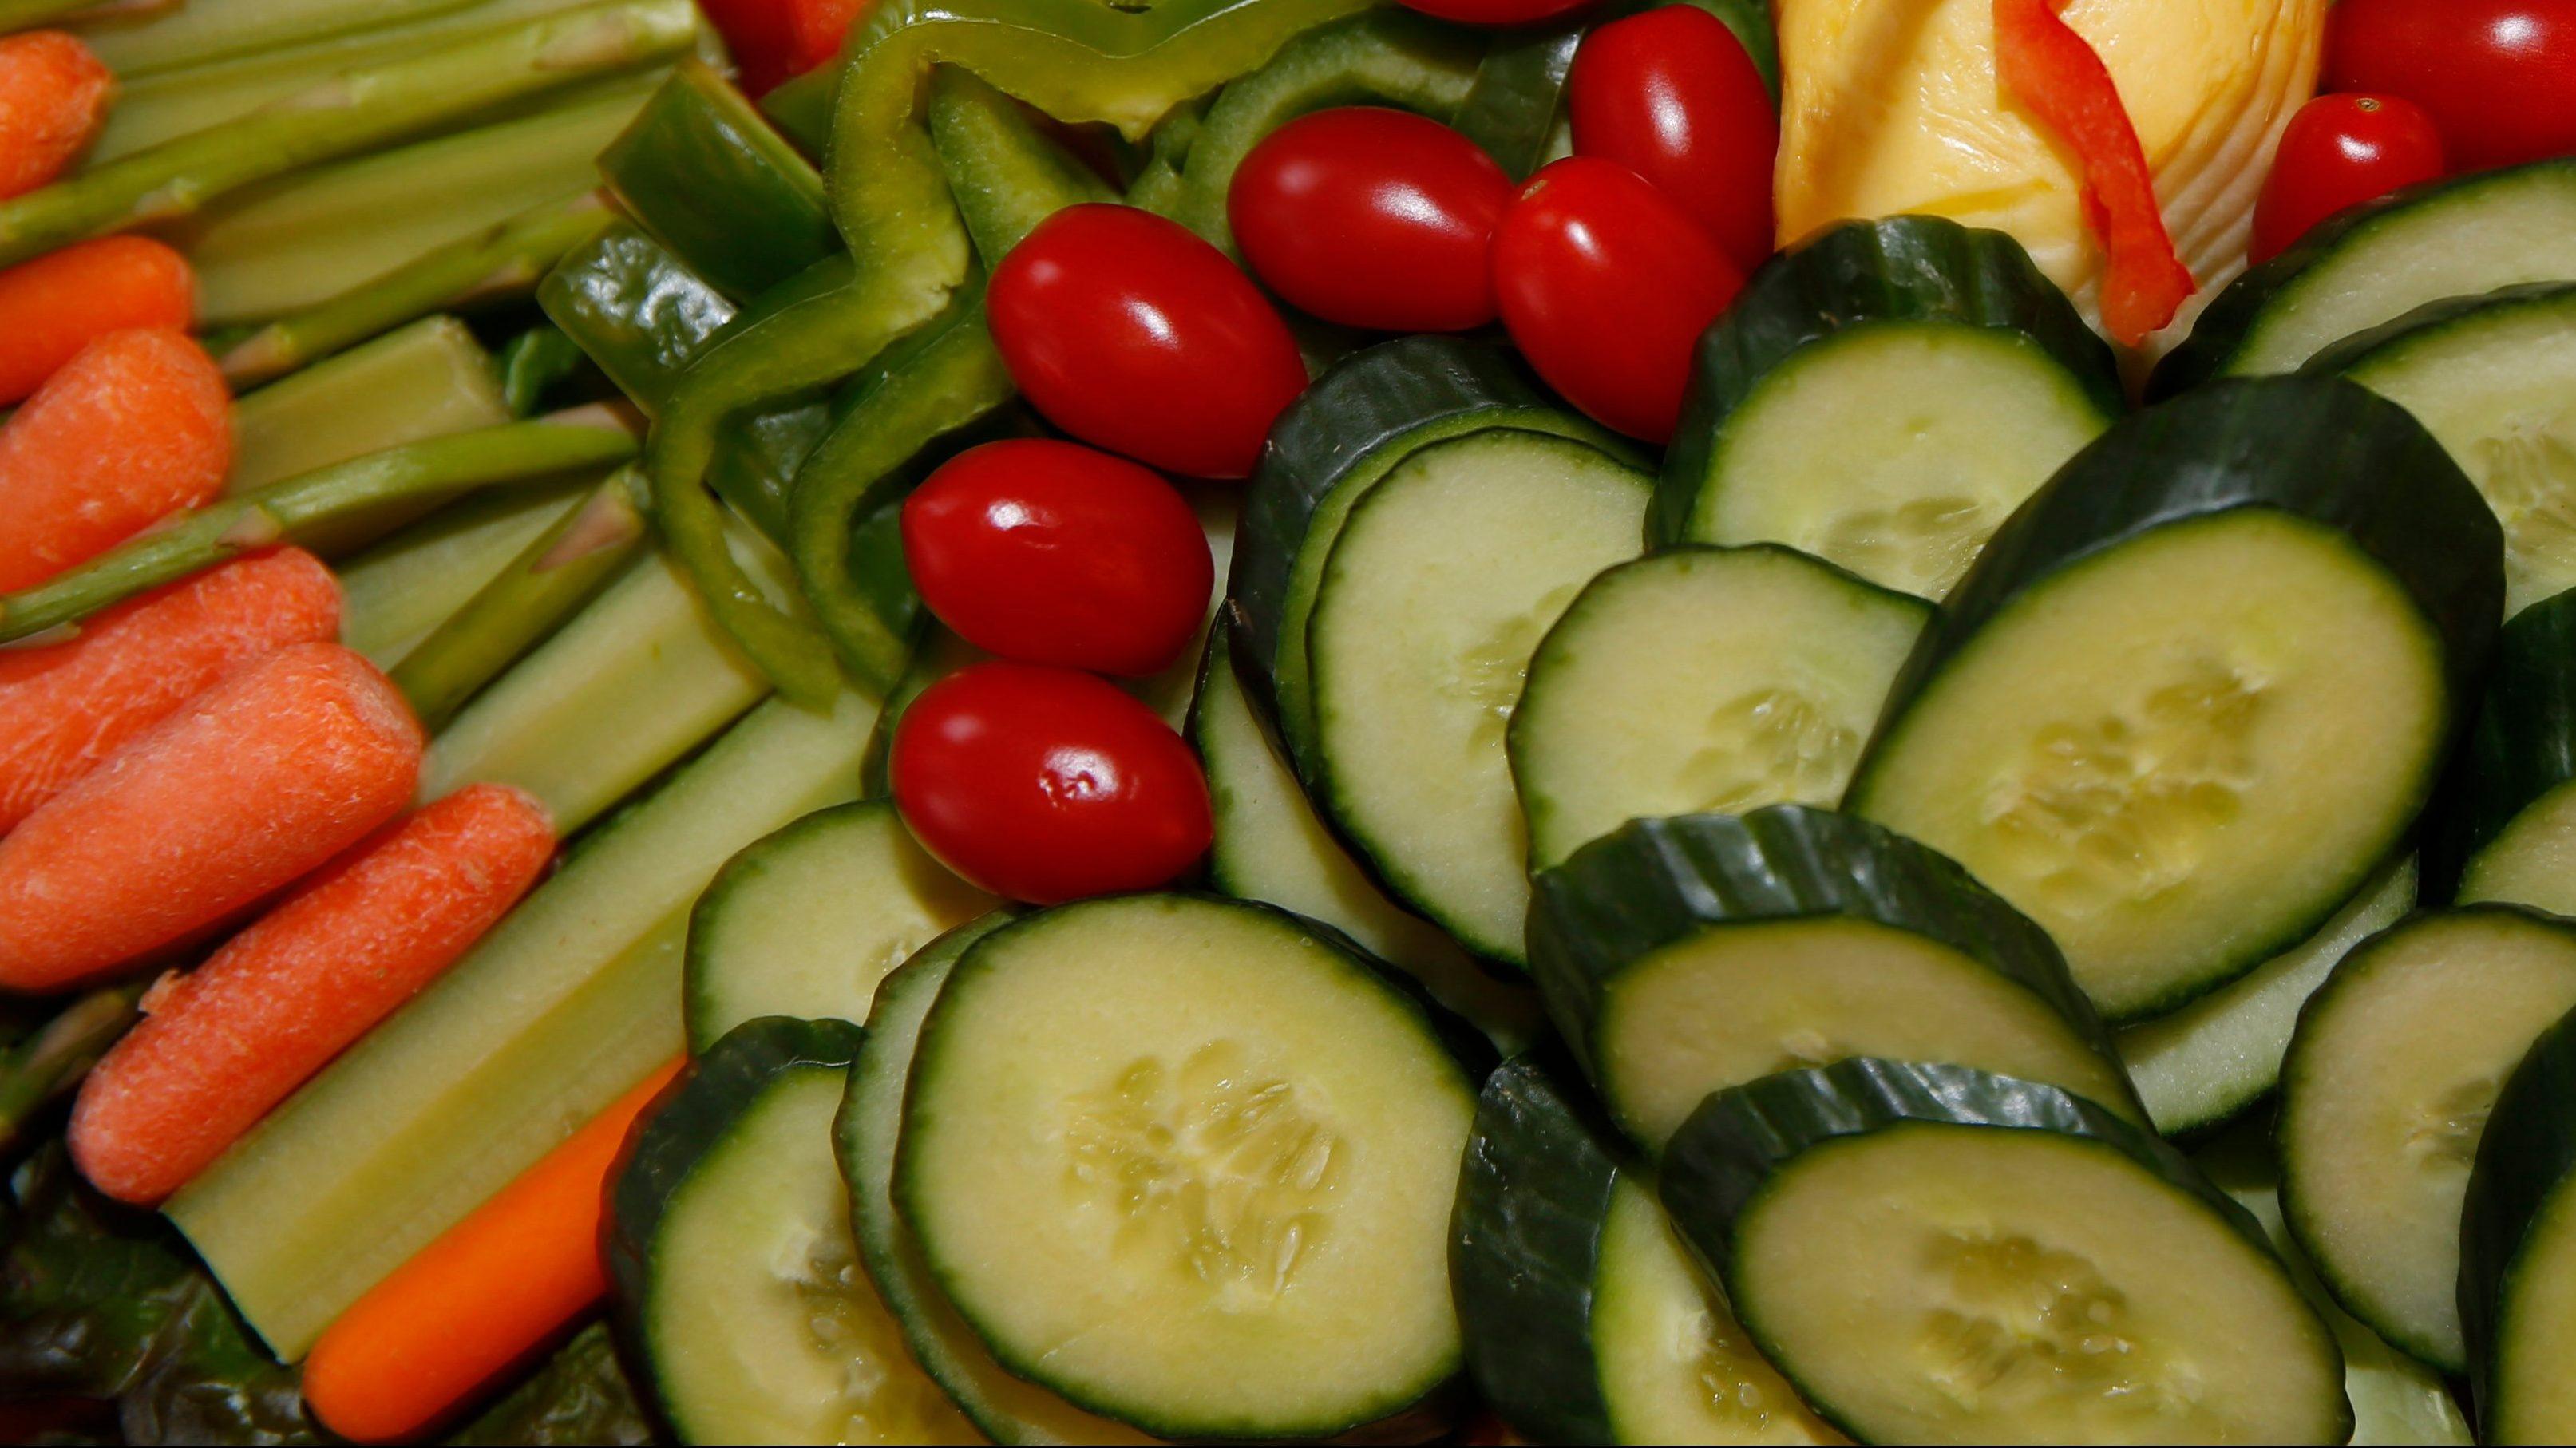 Crunchy vegetable videos are where ASMR meets mukbang — Quartz